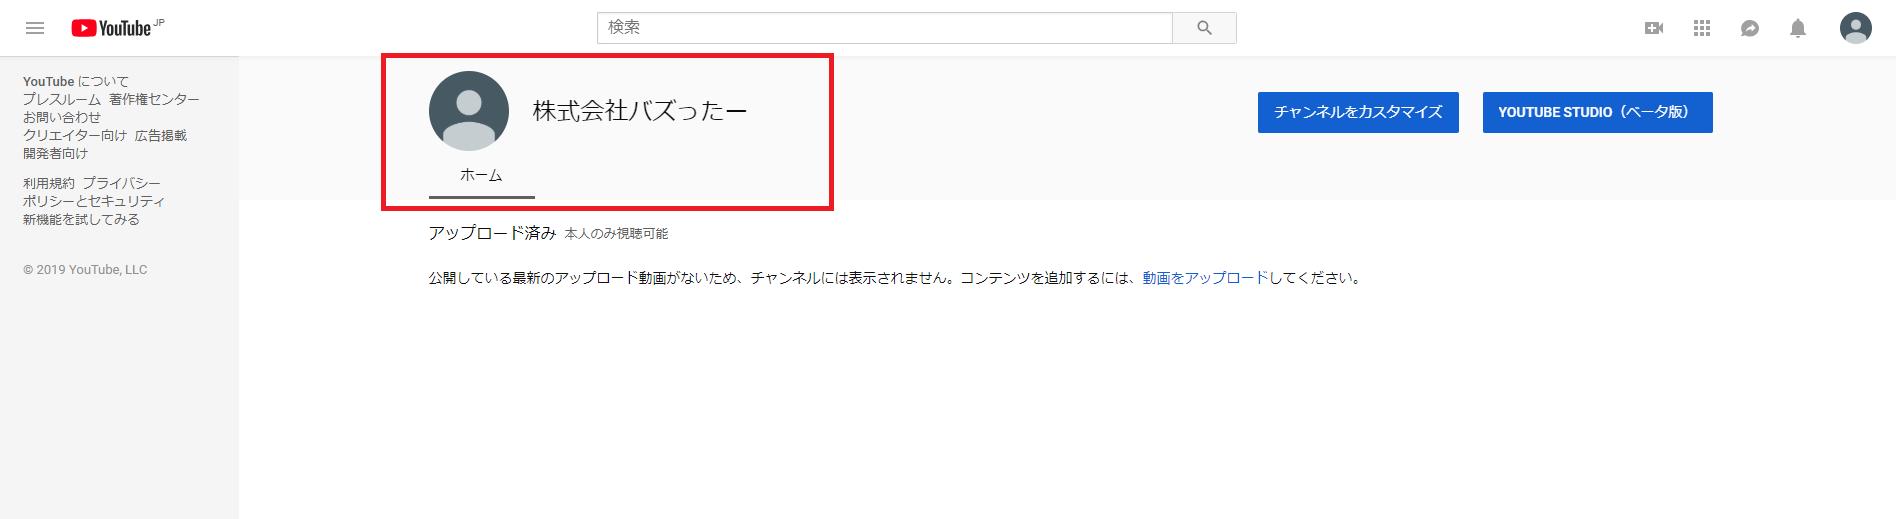 YouTube ブランドアカウント 作成-8